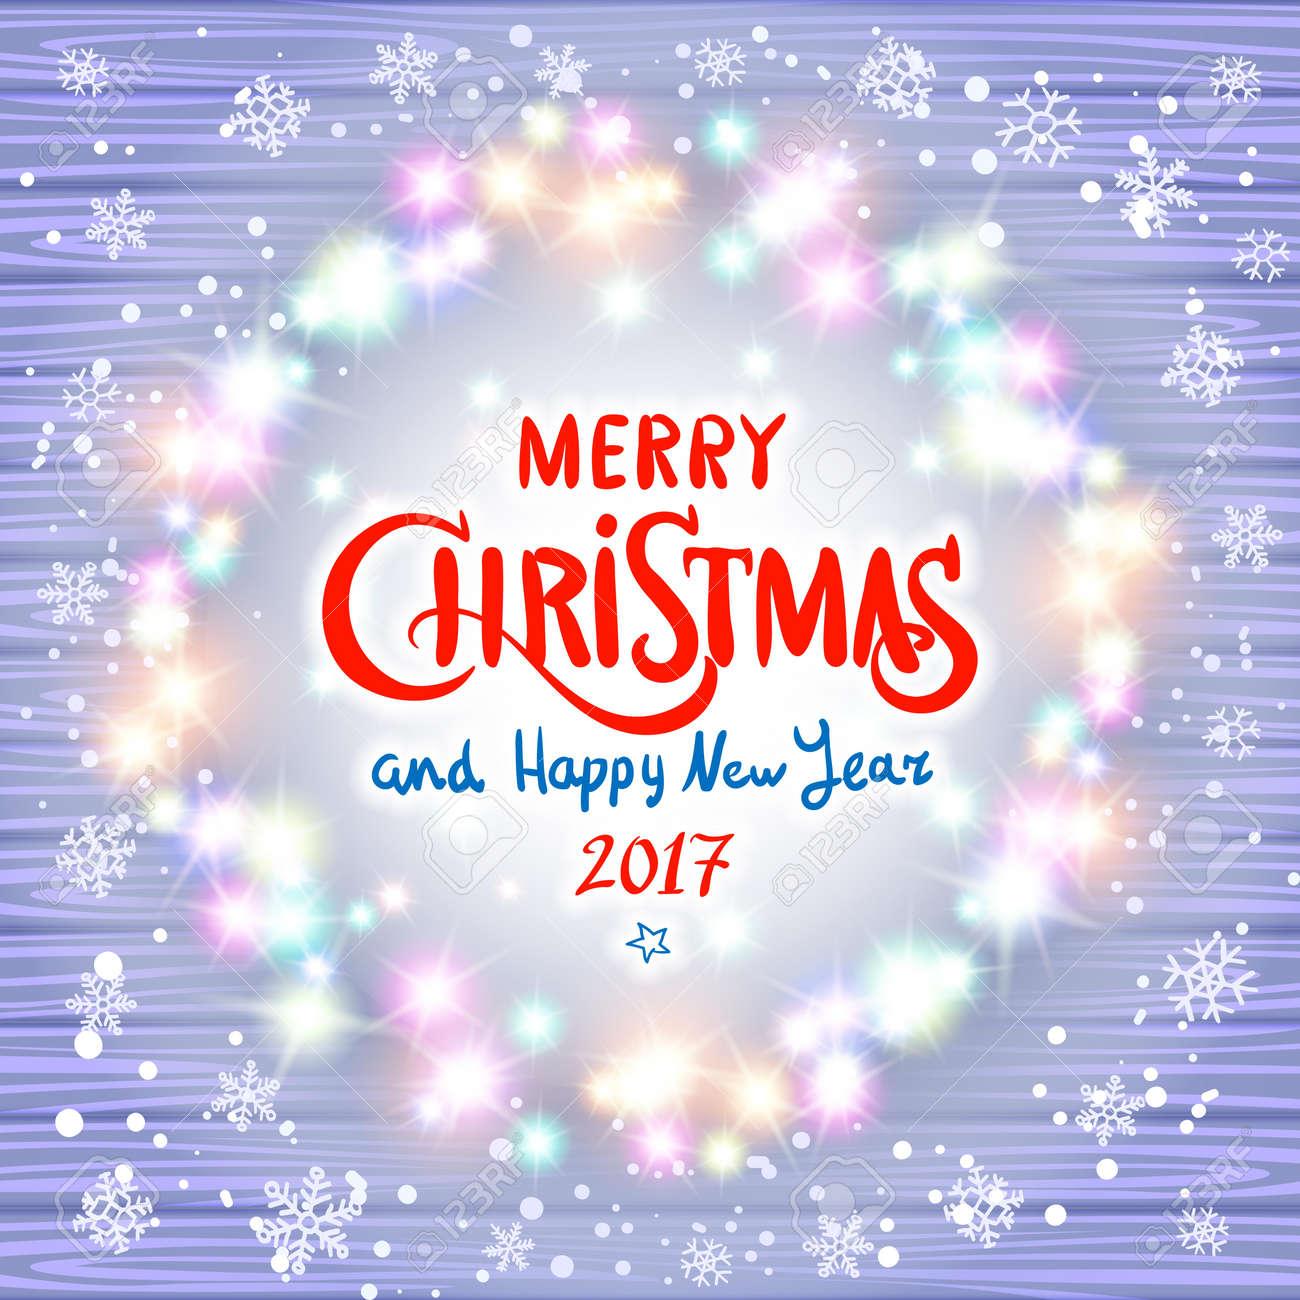 Led Frohe Weihnachten.Stock Photo